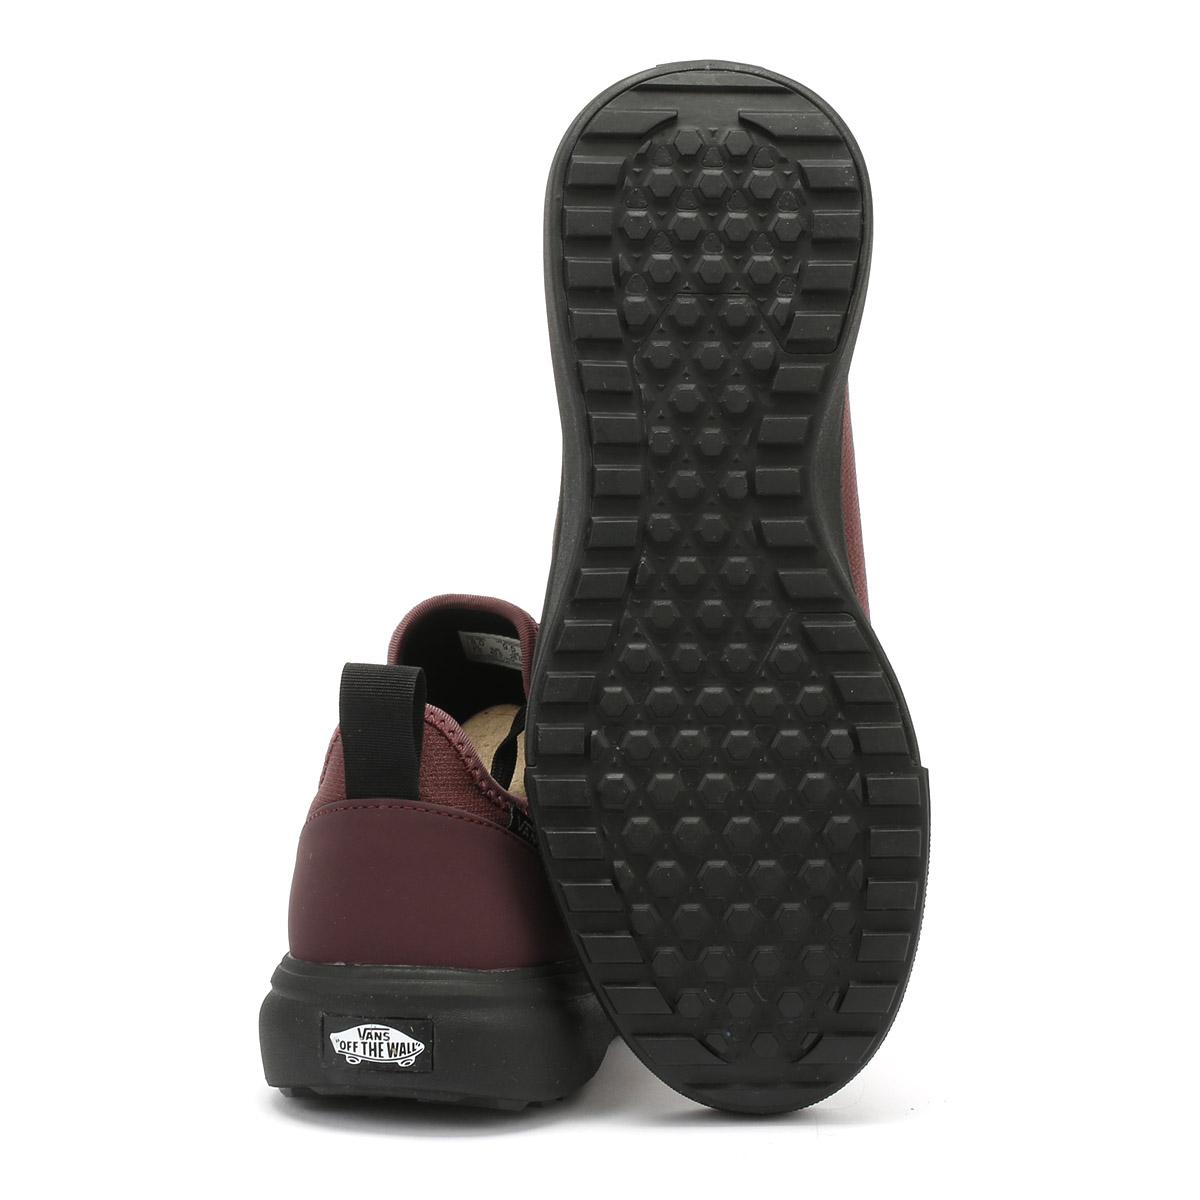 Vans Unisex Trainers Catawba Grape Burgundy Ultrarange AC Lace Up Up Up Casual Shoes d7986a